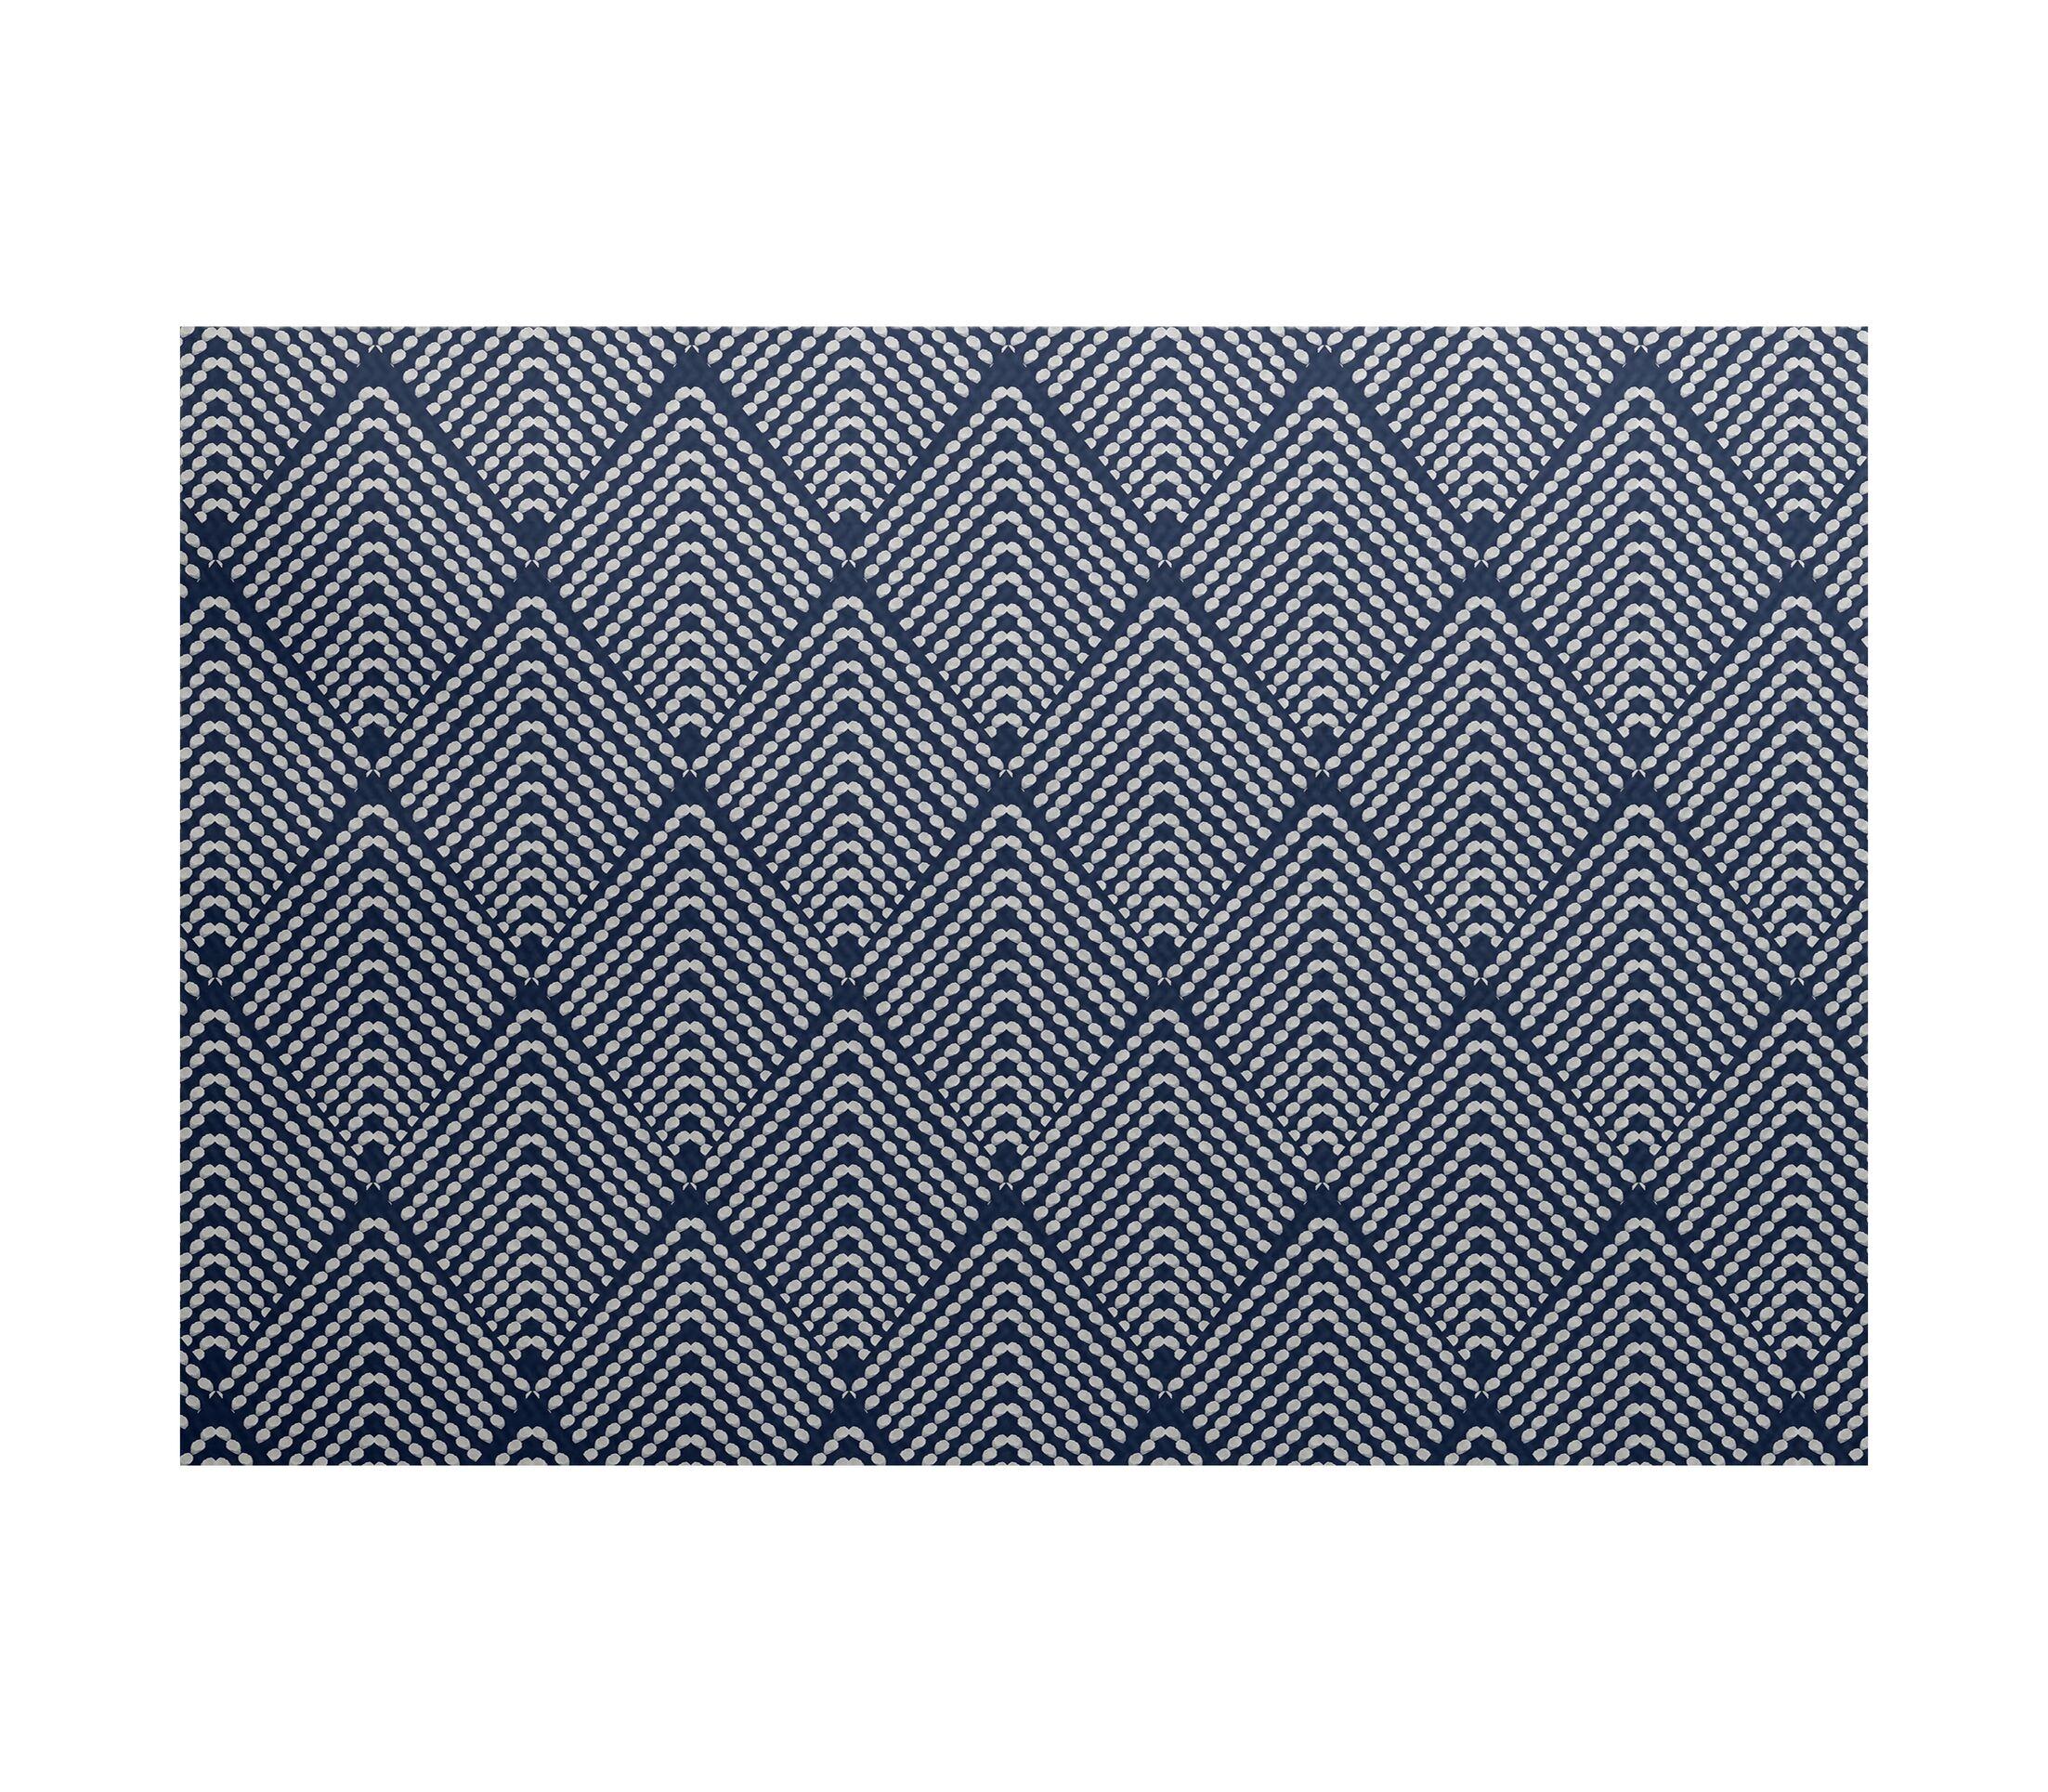 Waller Geometric Navy Blue Area Rug Rug Size: Rectangle 3' x 5'